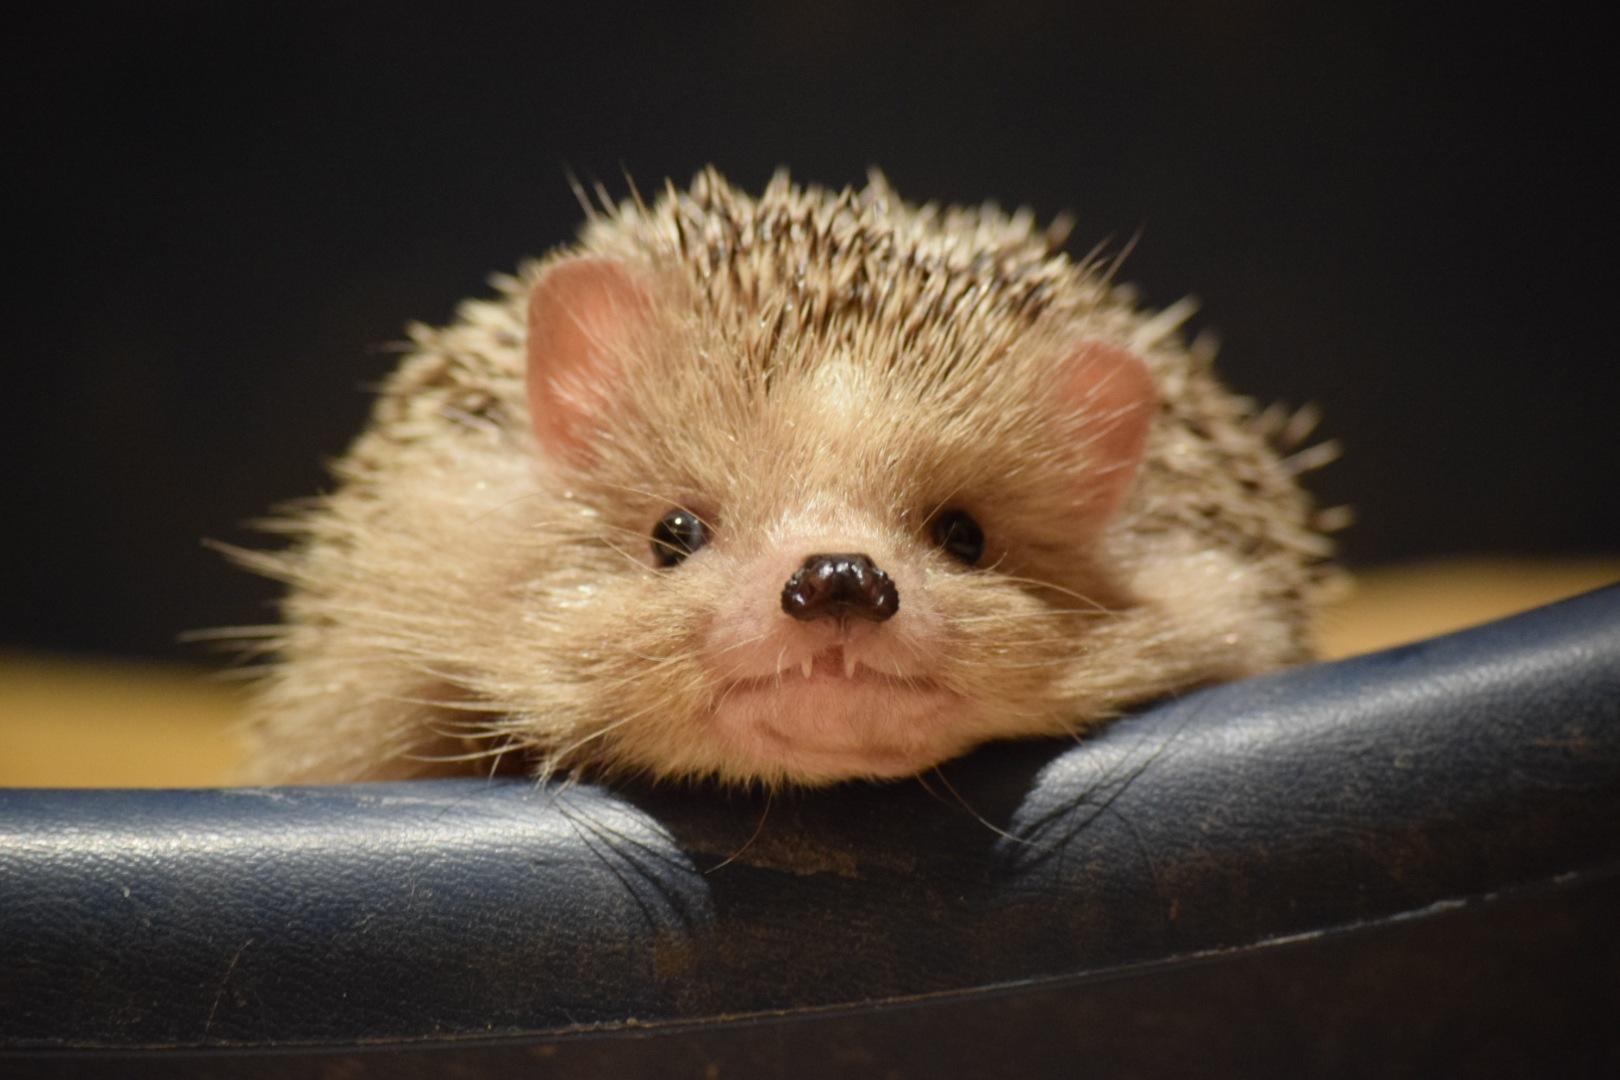 Spike my hedgehog  by José Sfeir